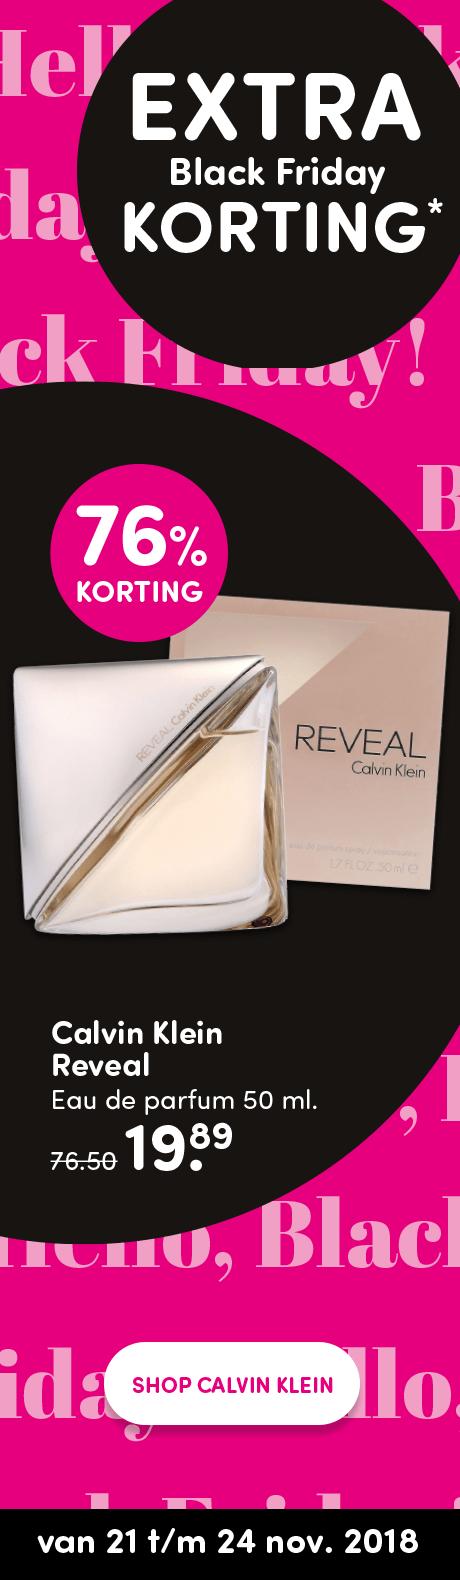 Calvin Klein reveal woman eau de parfum 50ml